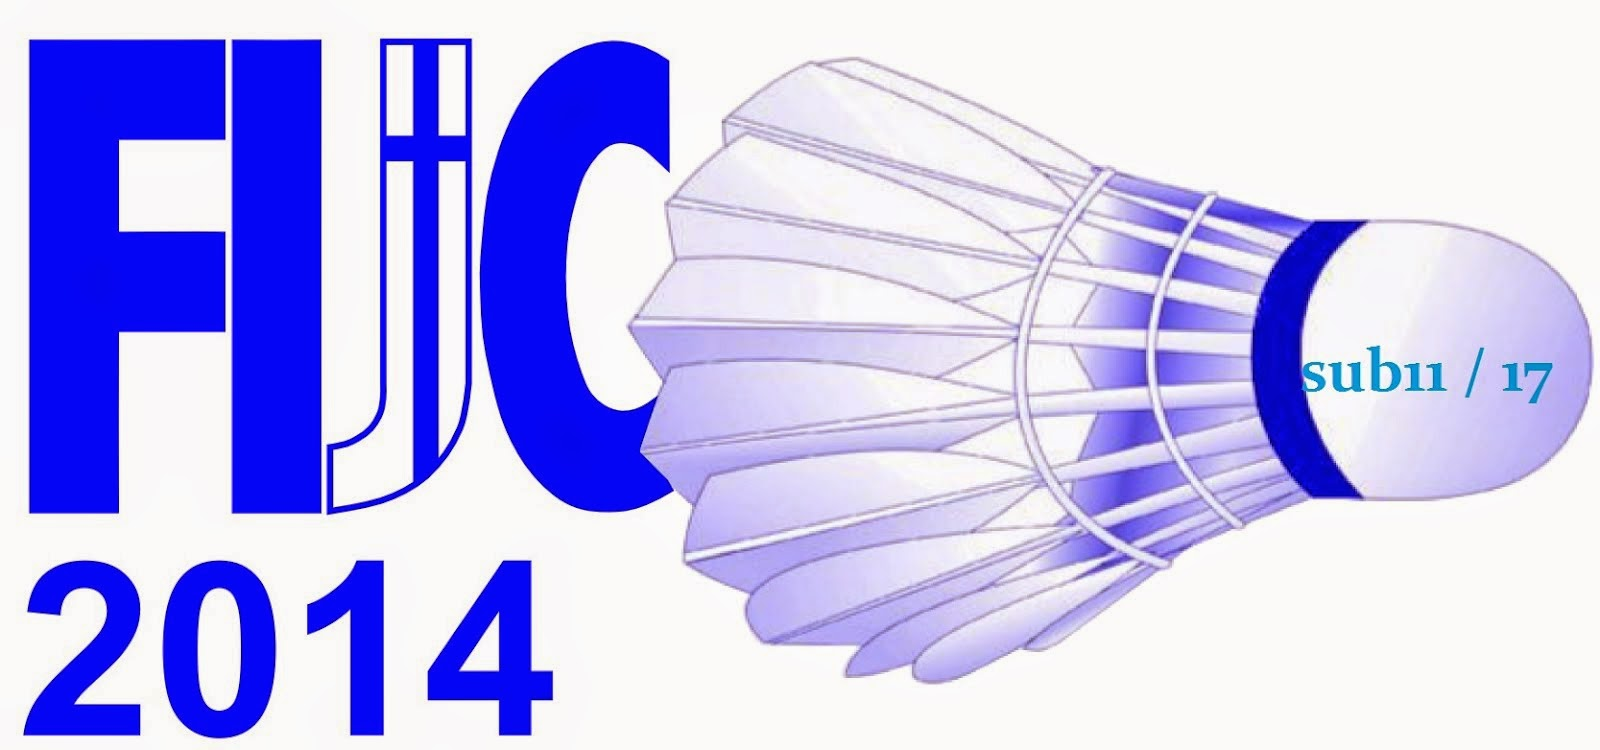 Finnish International sub11/sub17 2014